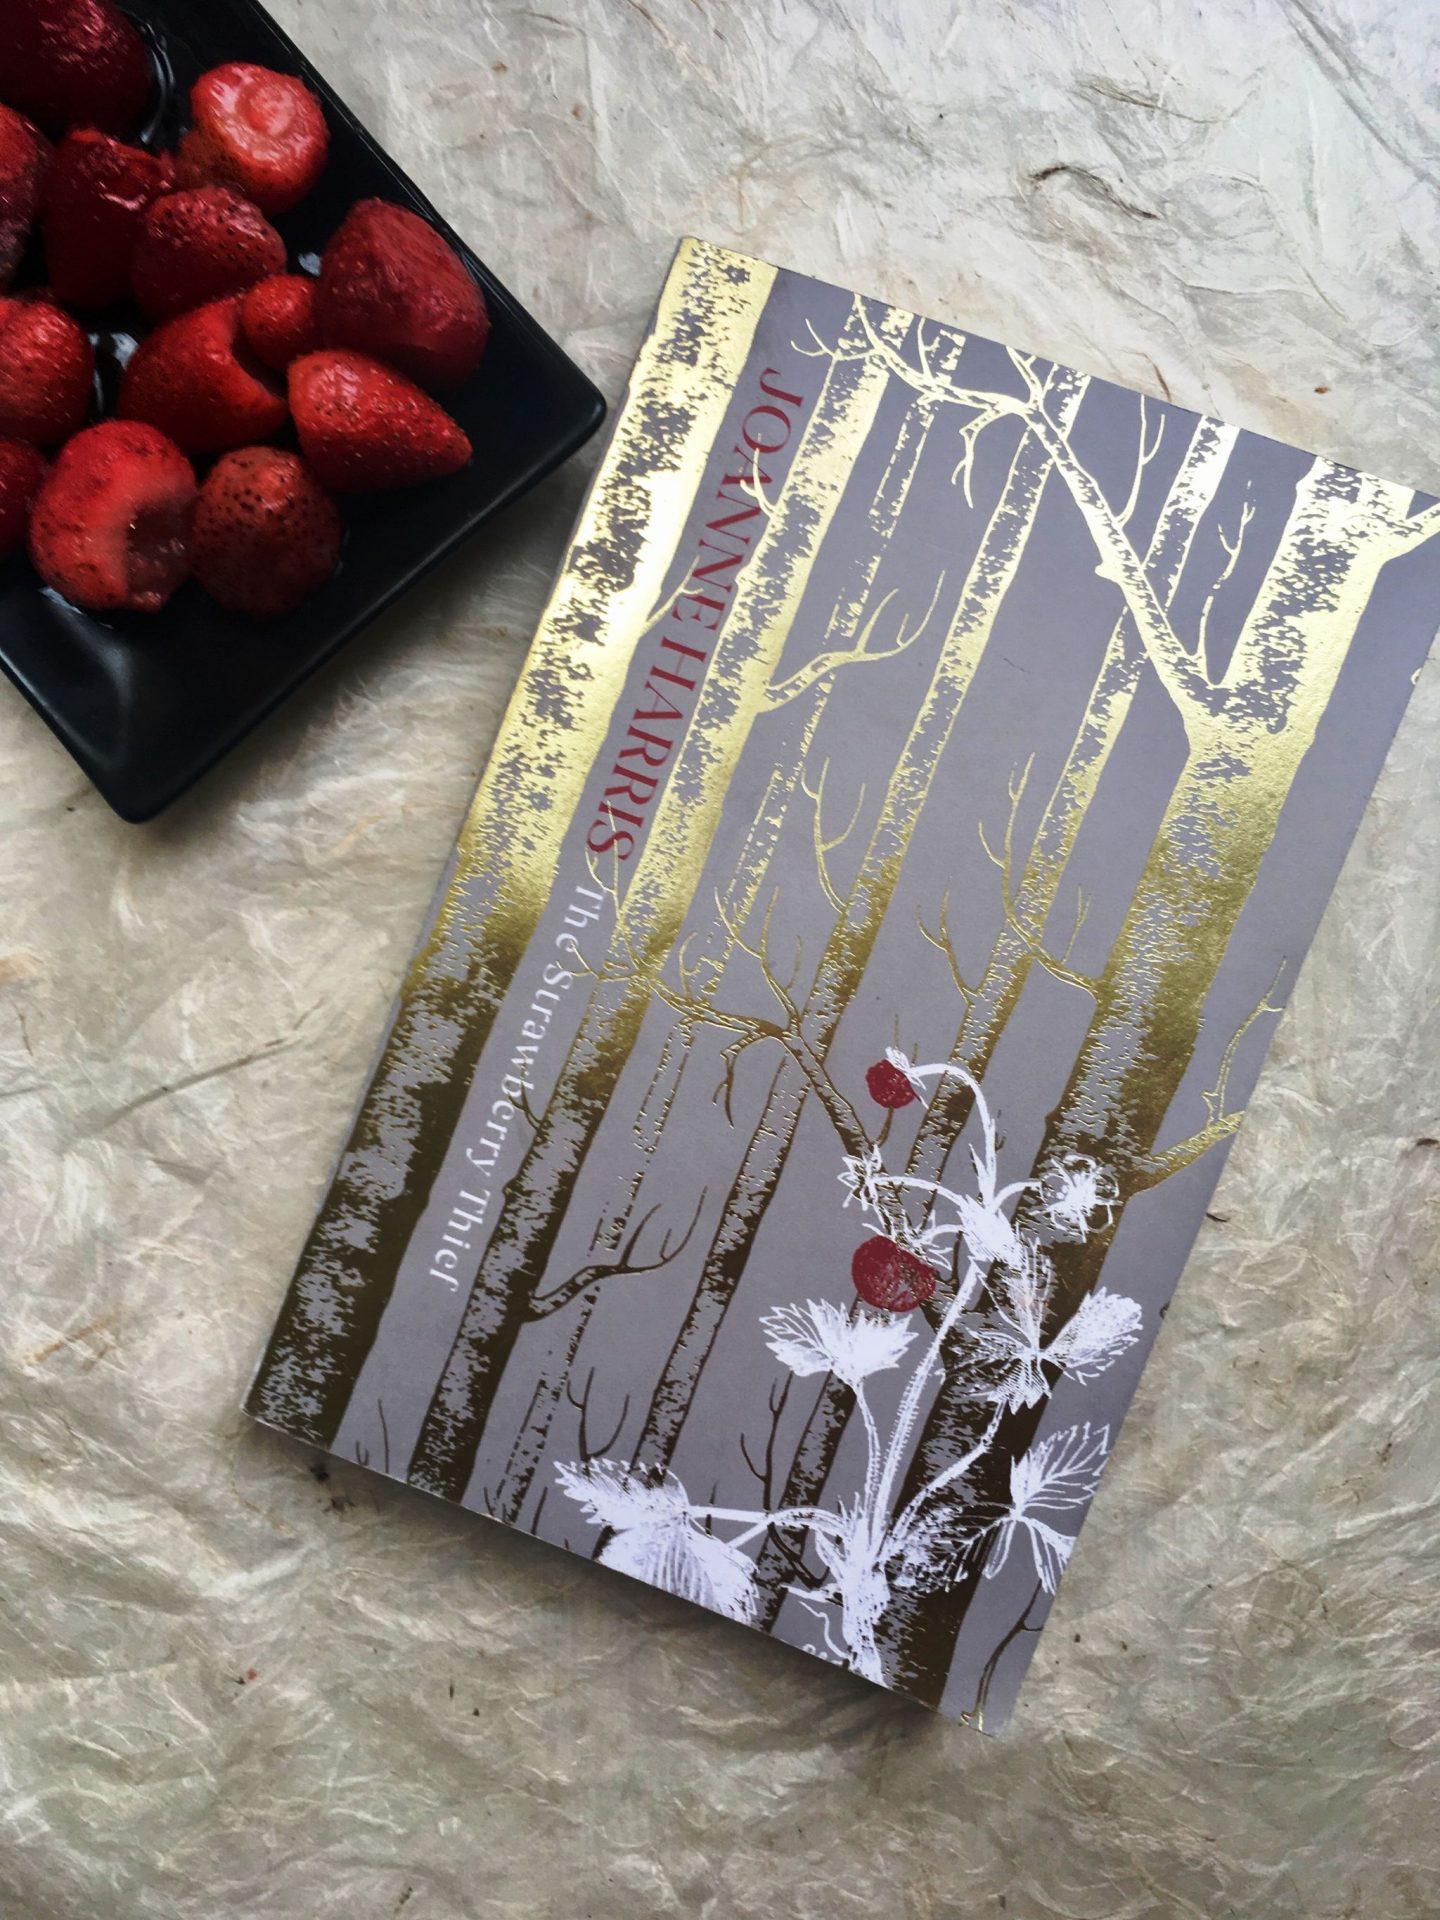 The Strawberry Thief: beautifully stirring the senses